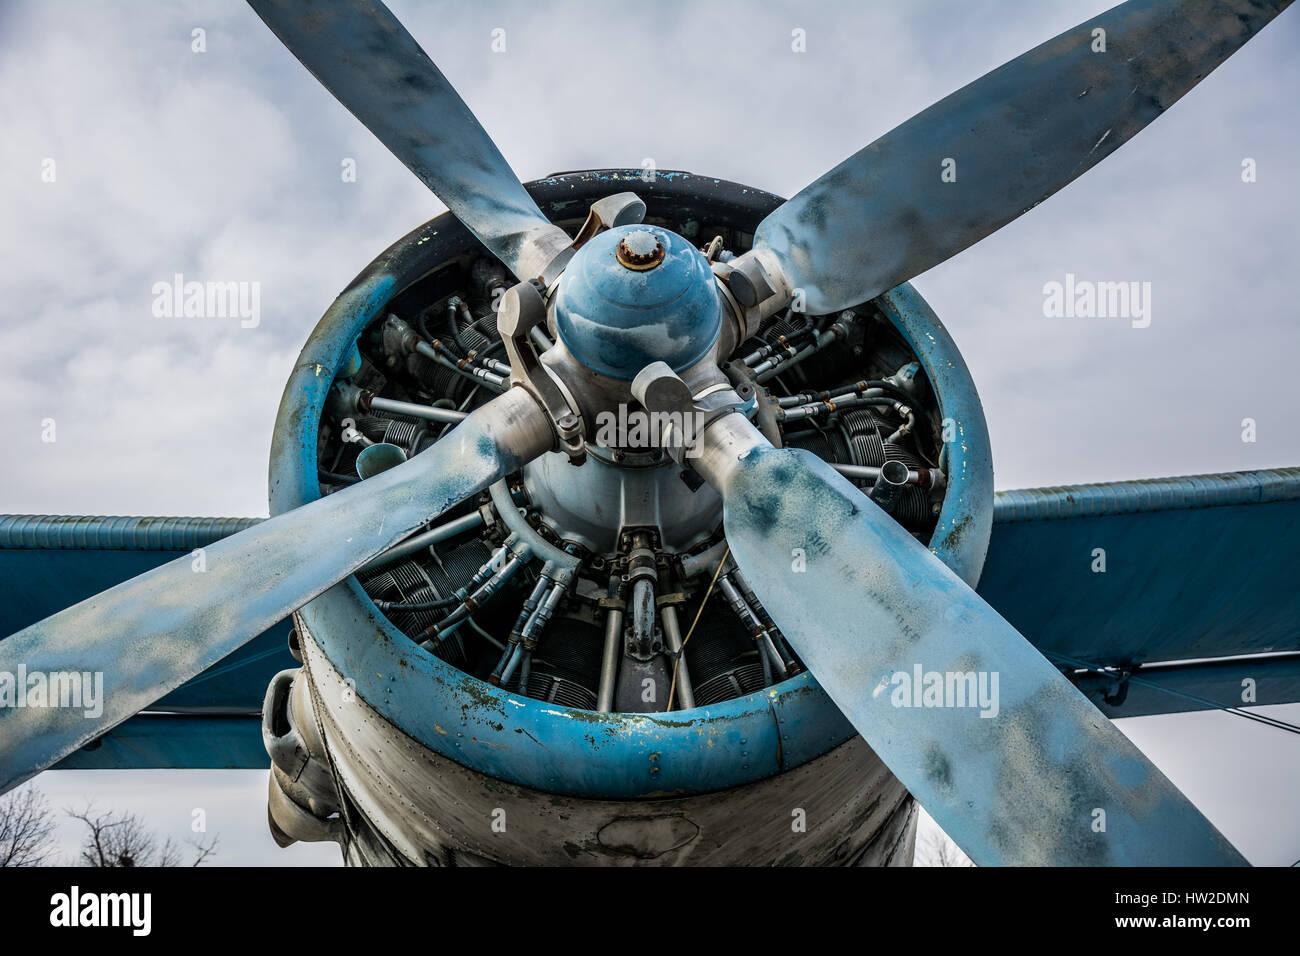 Screw of Soviet AN-2 plane close-up - Stock Image